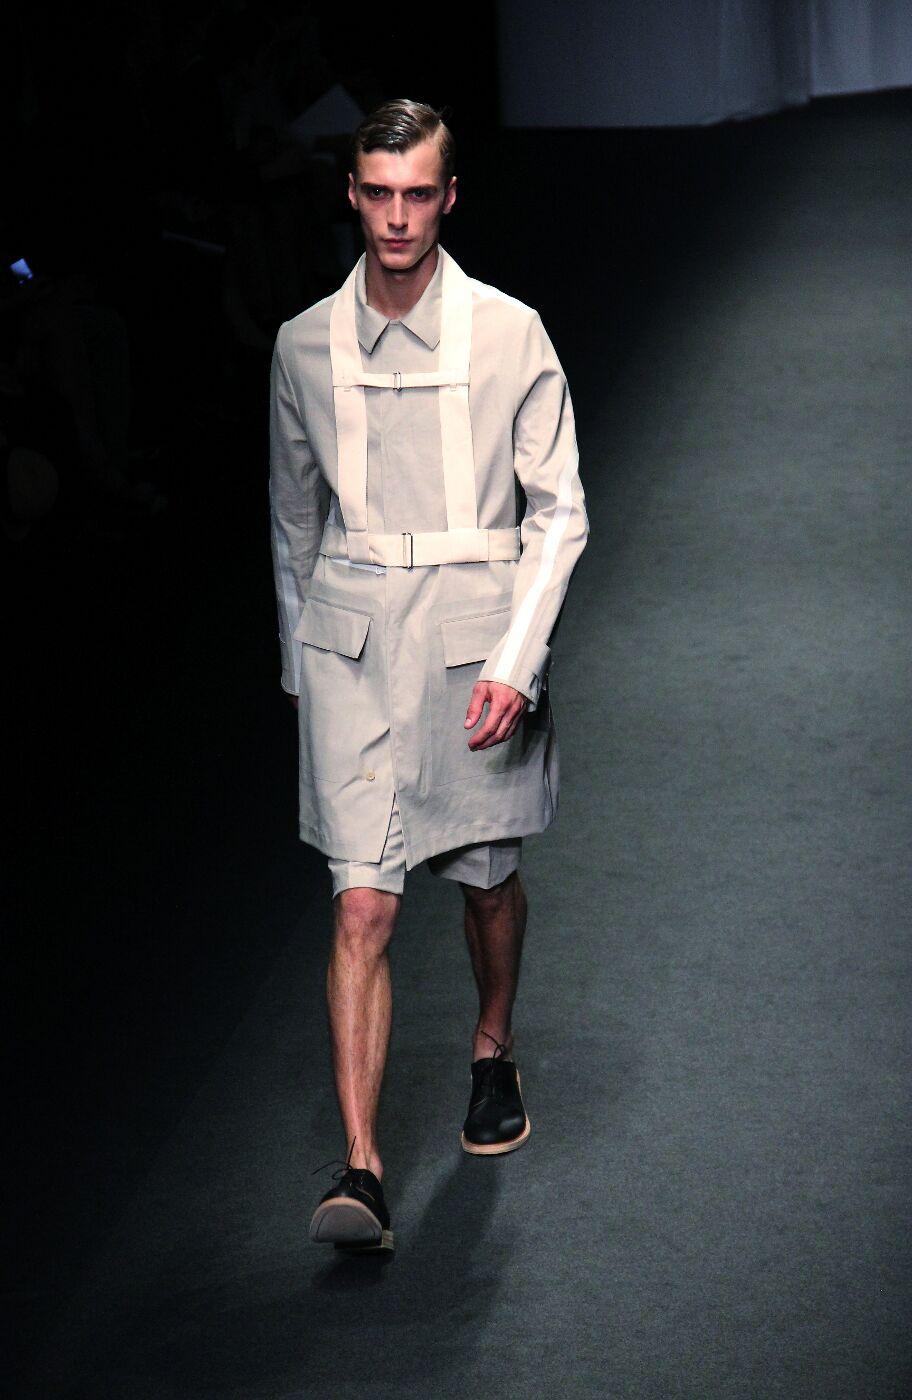 nicole-farhi-spring-summer-2012-men-collection-milano-fashion-week-2012-nicole-farhi-primavera-estate-catwalk-2012